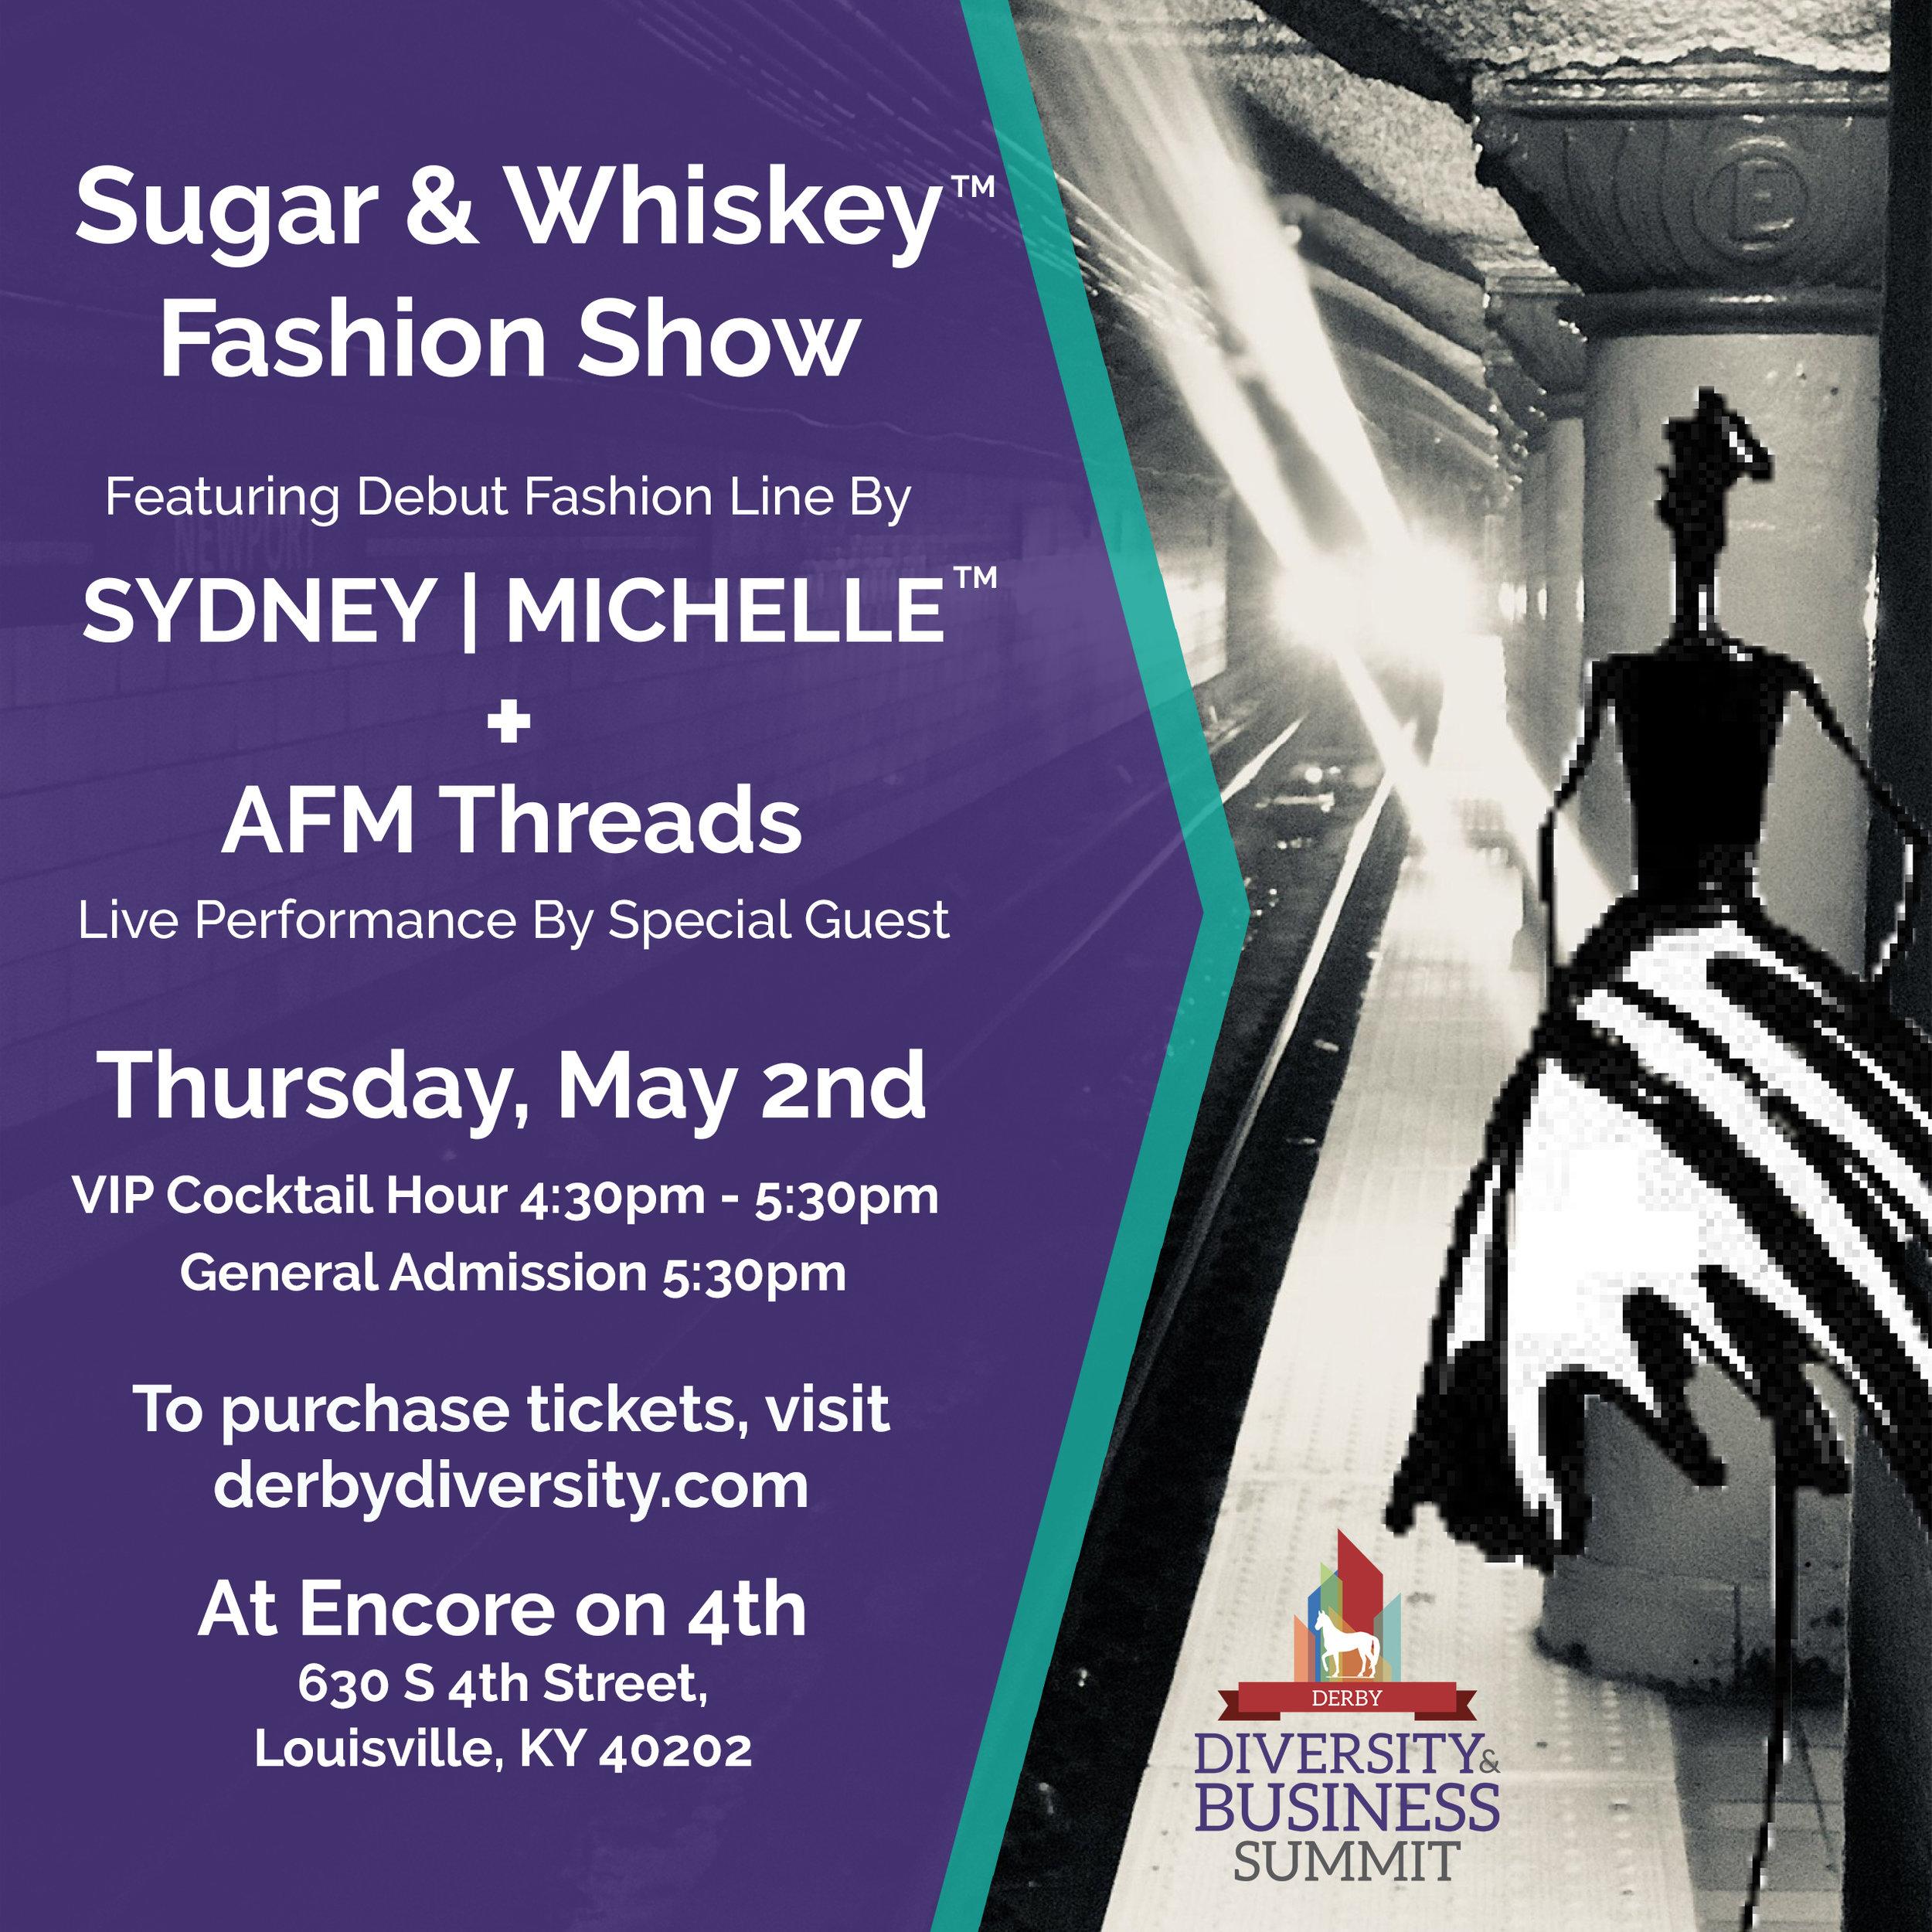 Fashion-Show-Panel-Graphic-IG.jpg